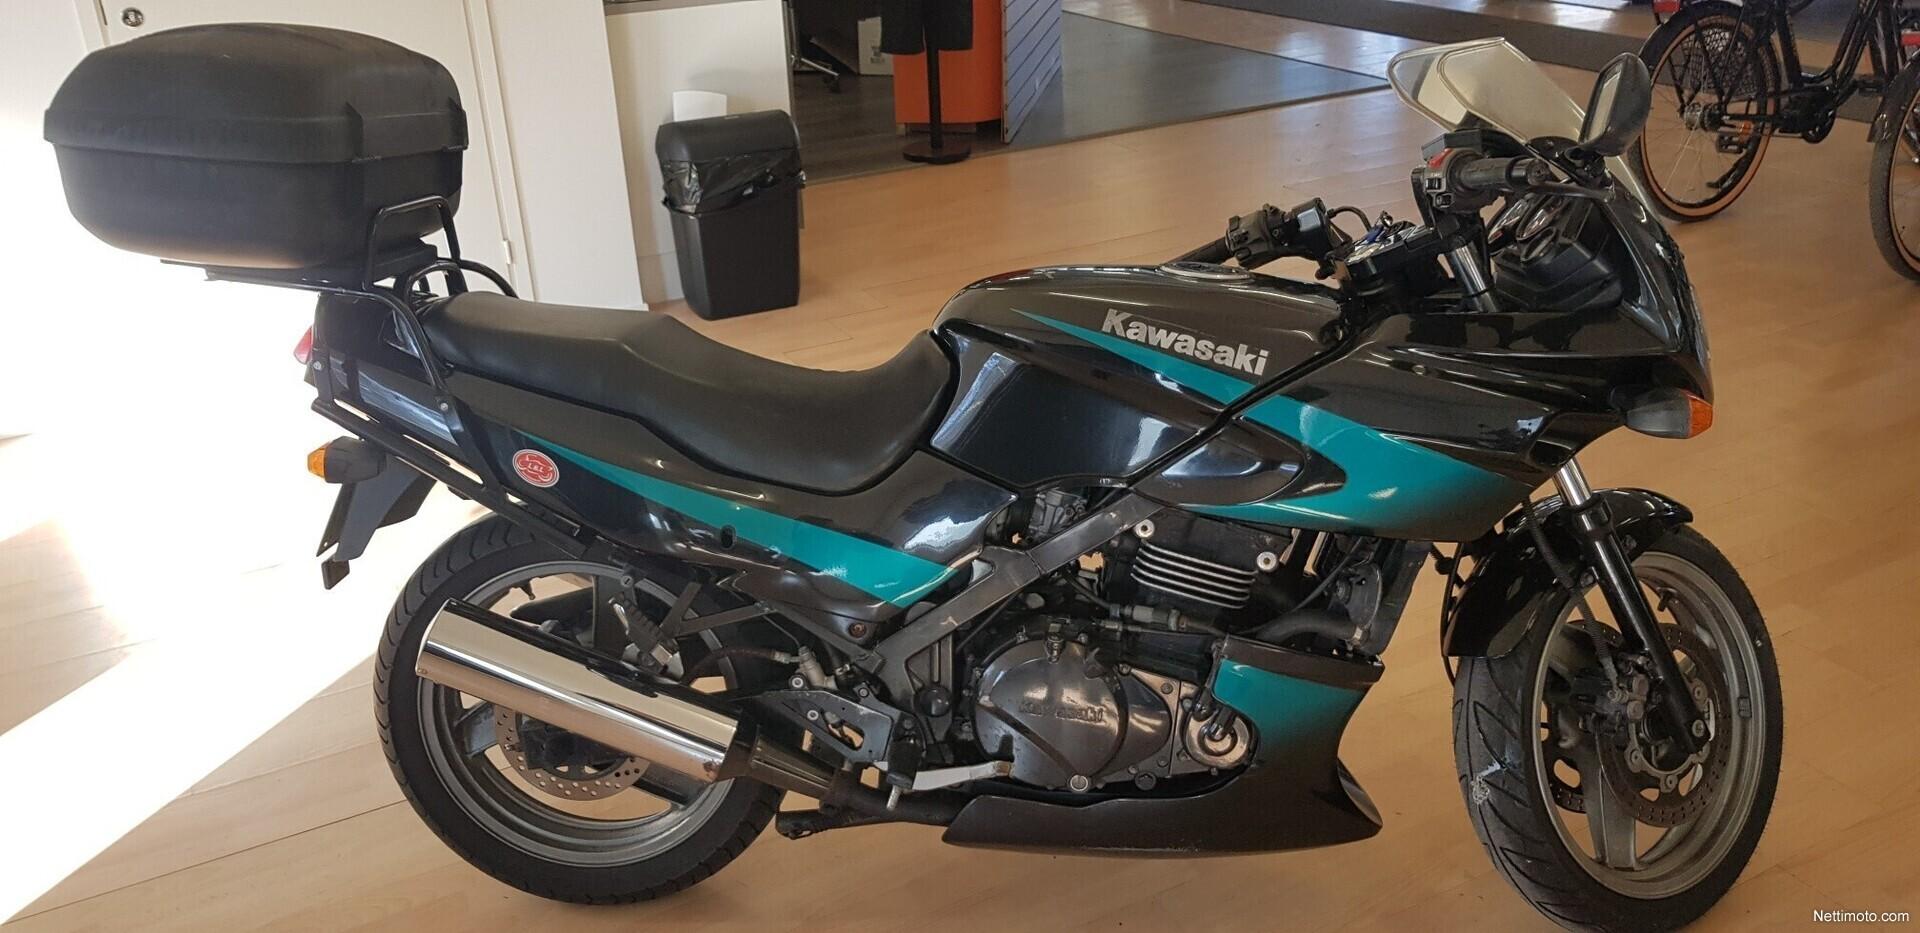 Kawasaki GPZ Katu/Matka/Sport 500S